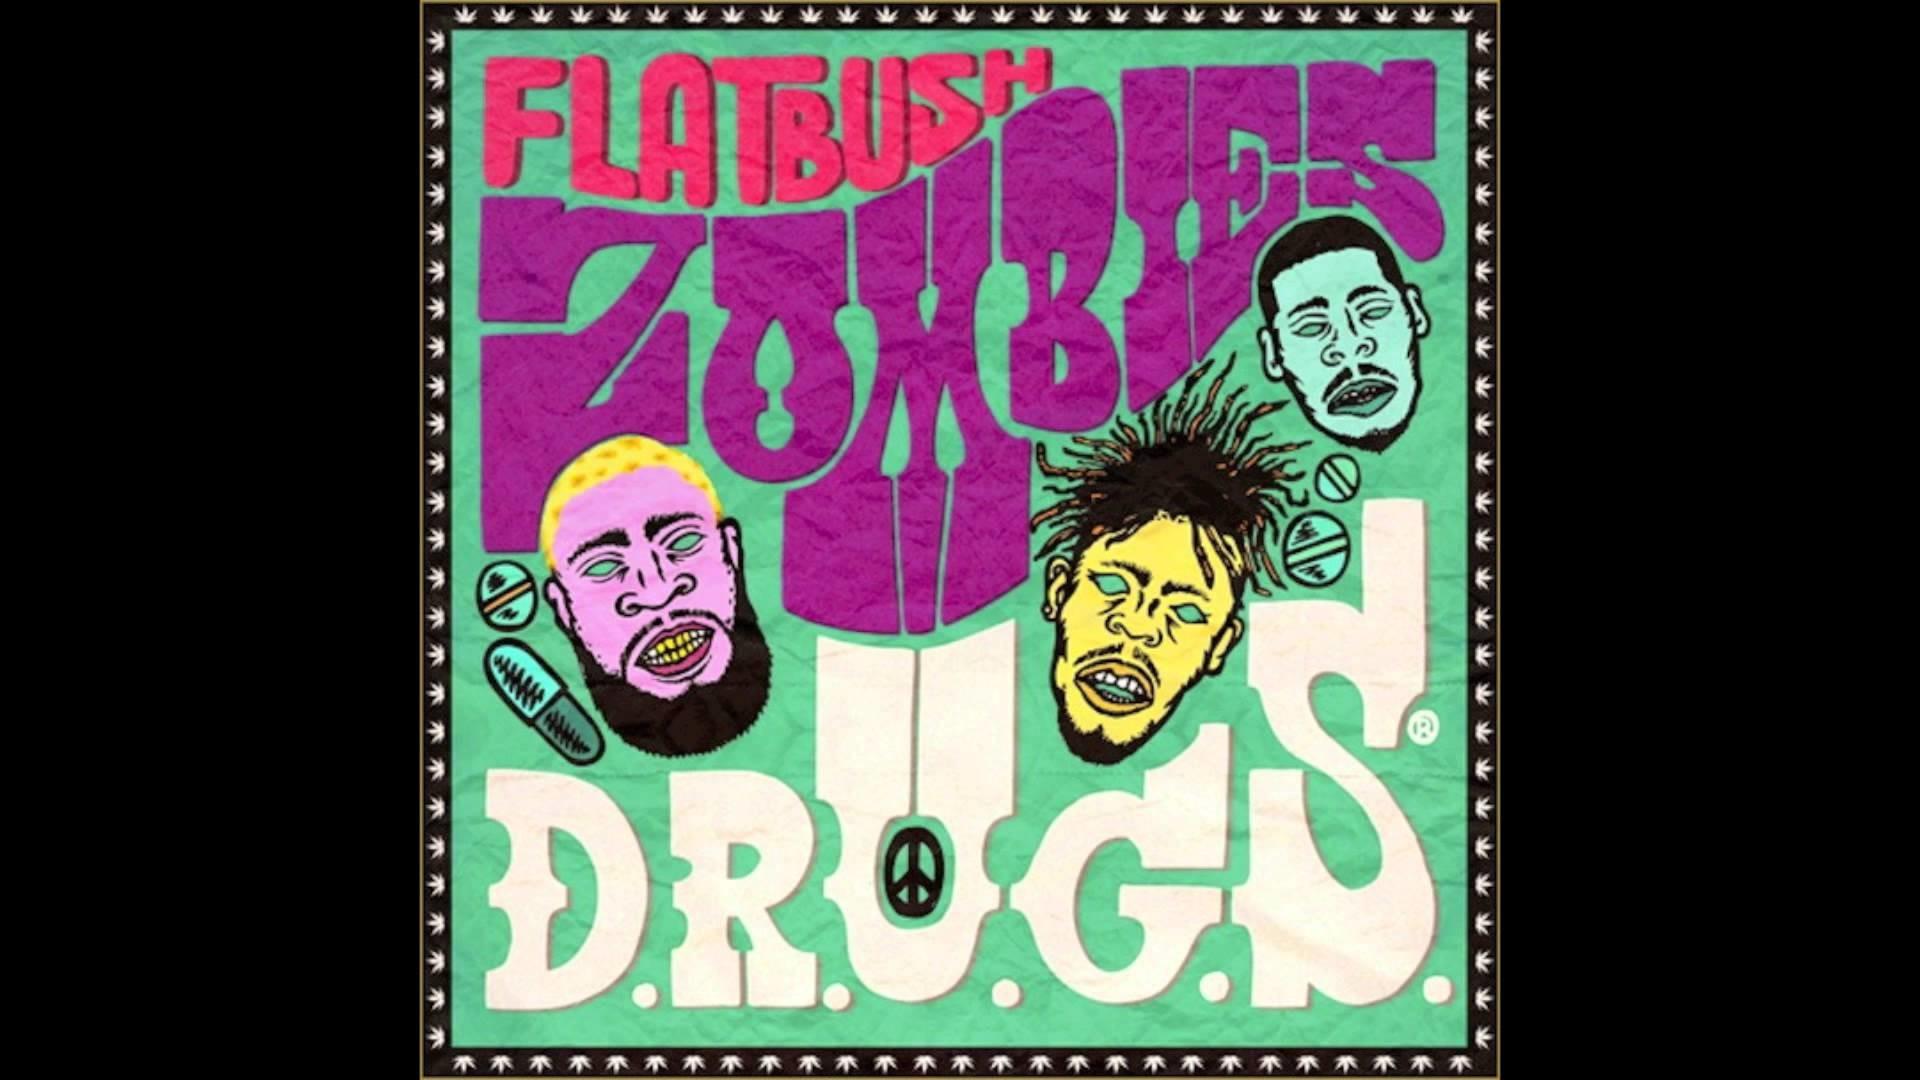 Al Bundy – Flatbush Zombies [D.R.U.G.S.] (2012)